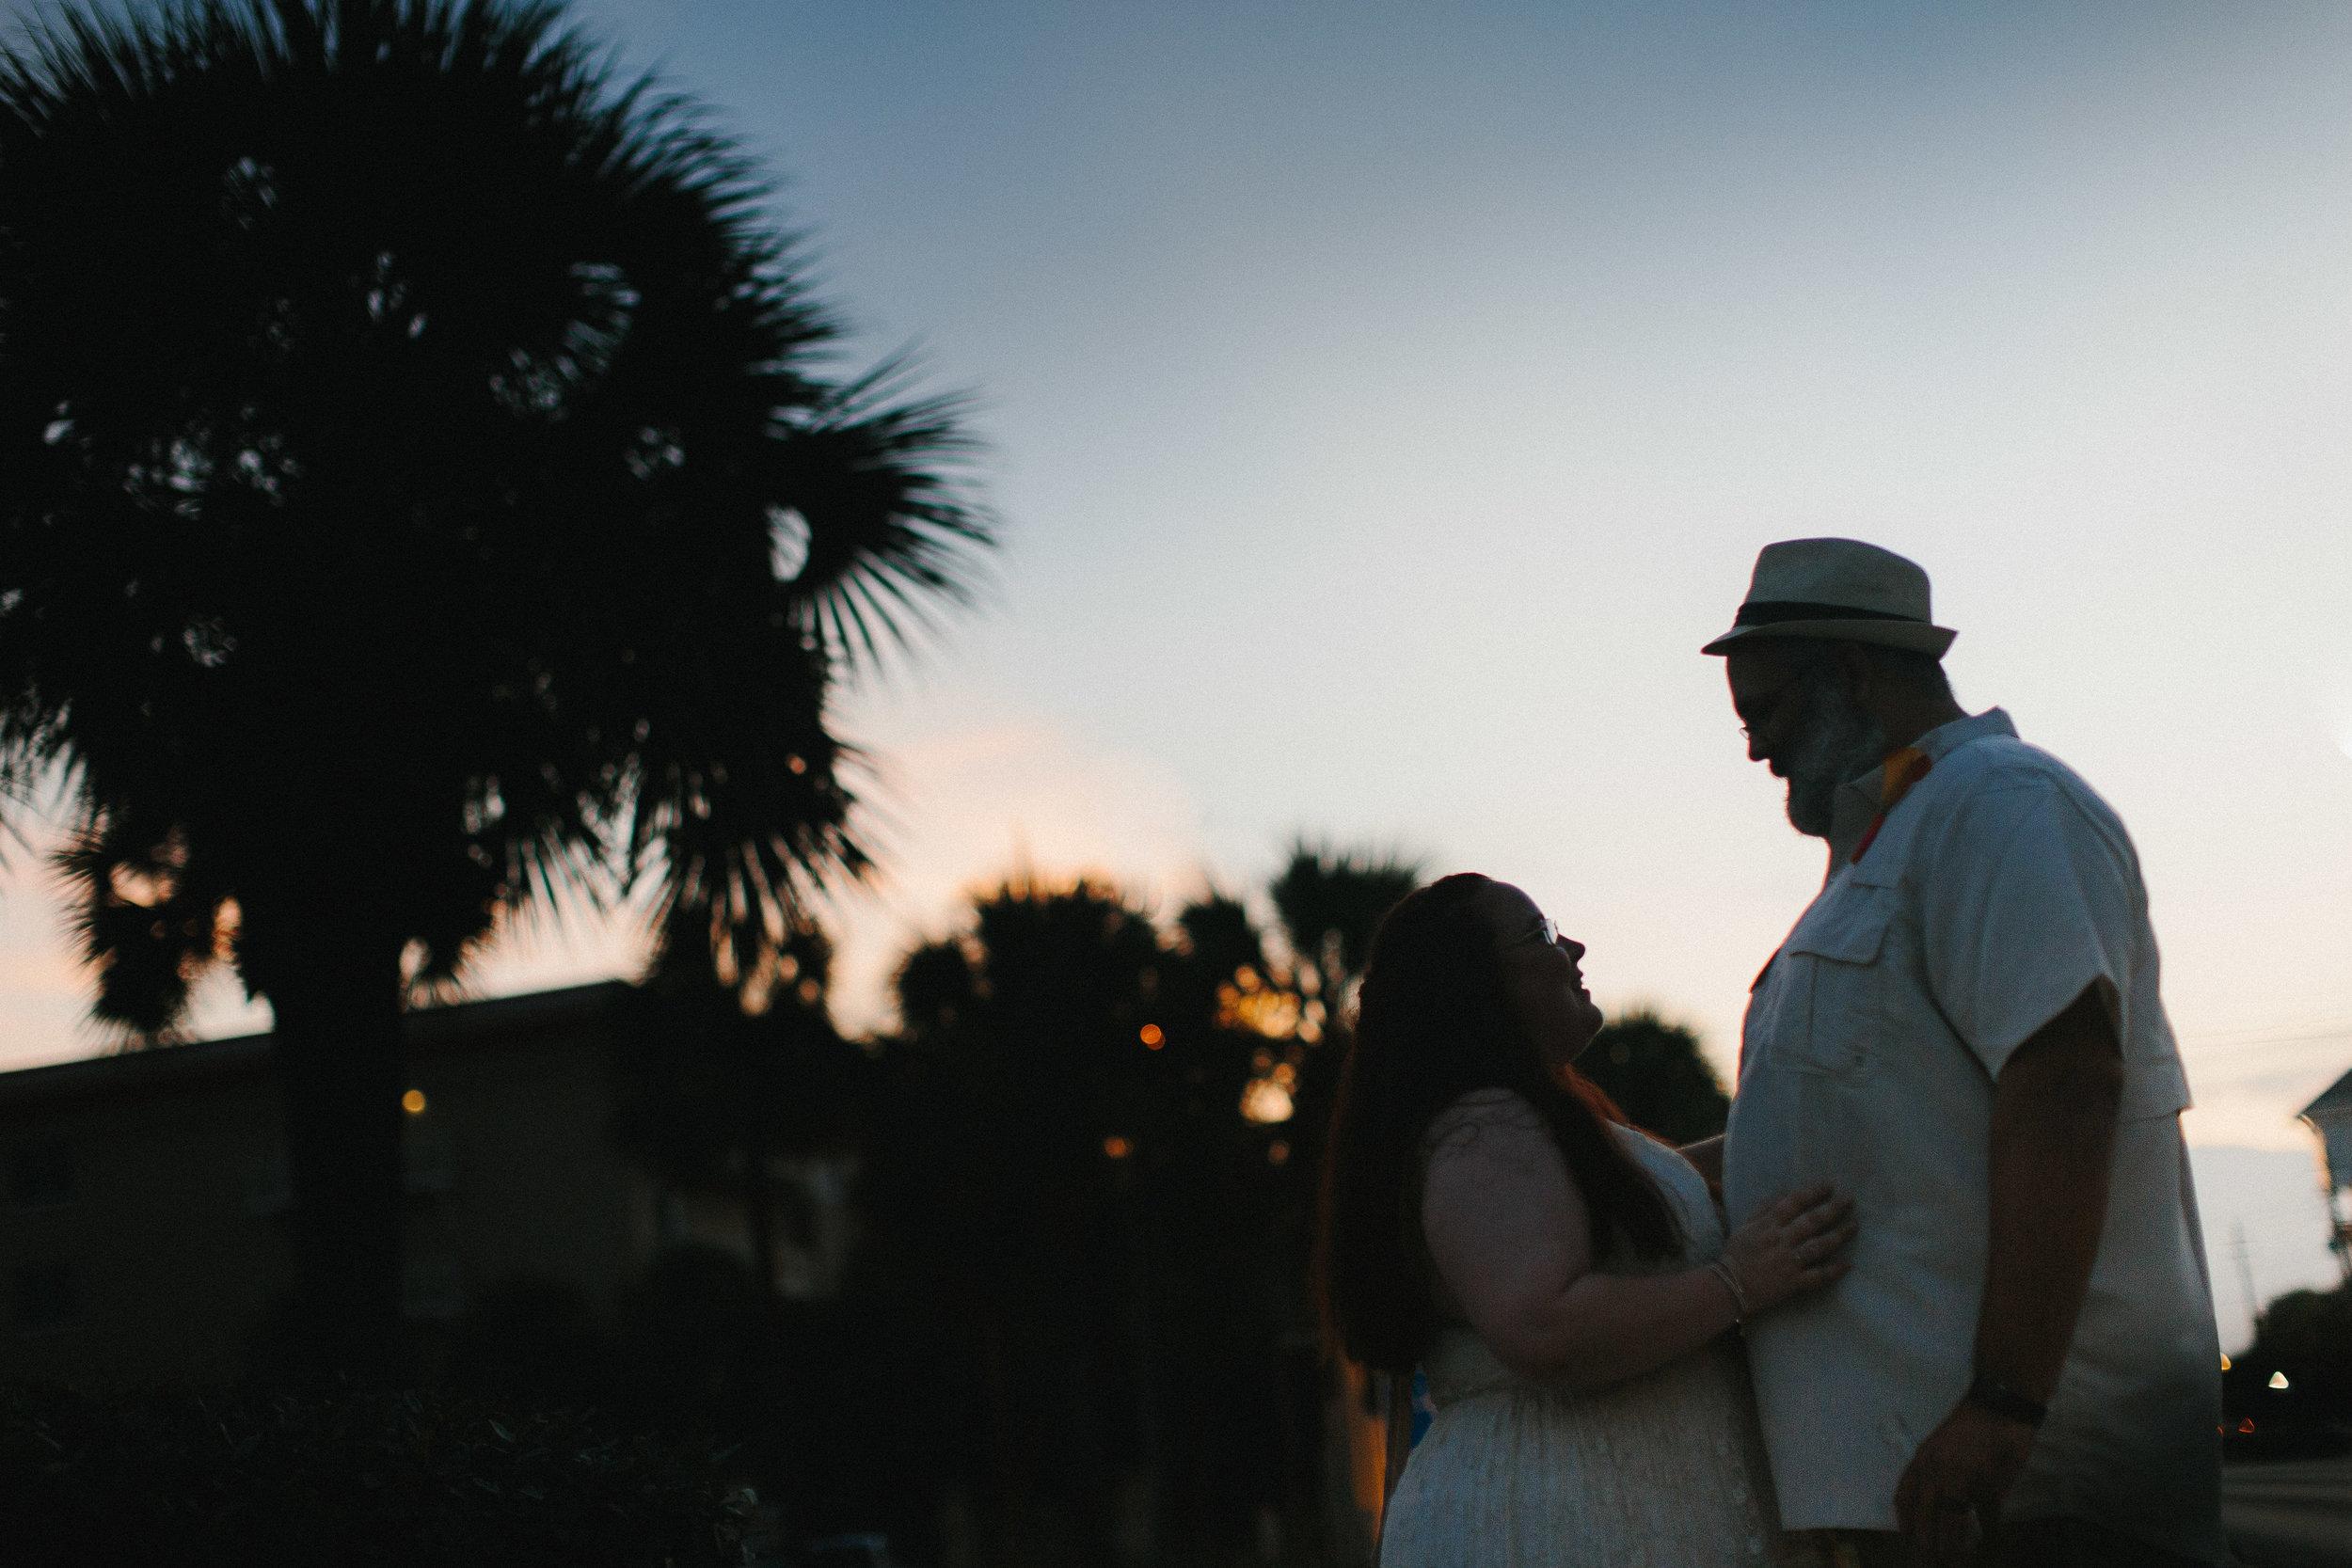 destin_sunset_beach_elopement_intimate_wedding_photographer_florida_documentary_1378.jpg